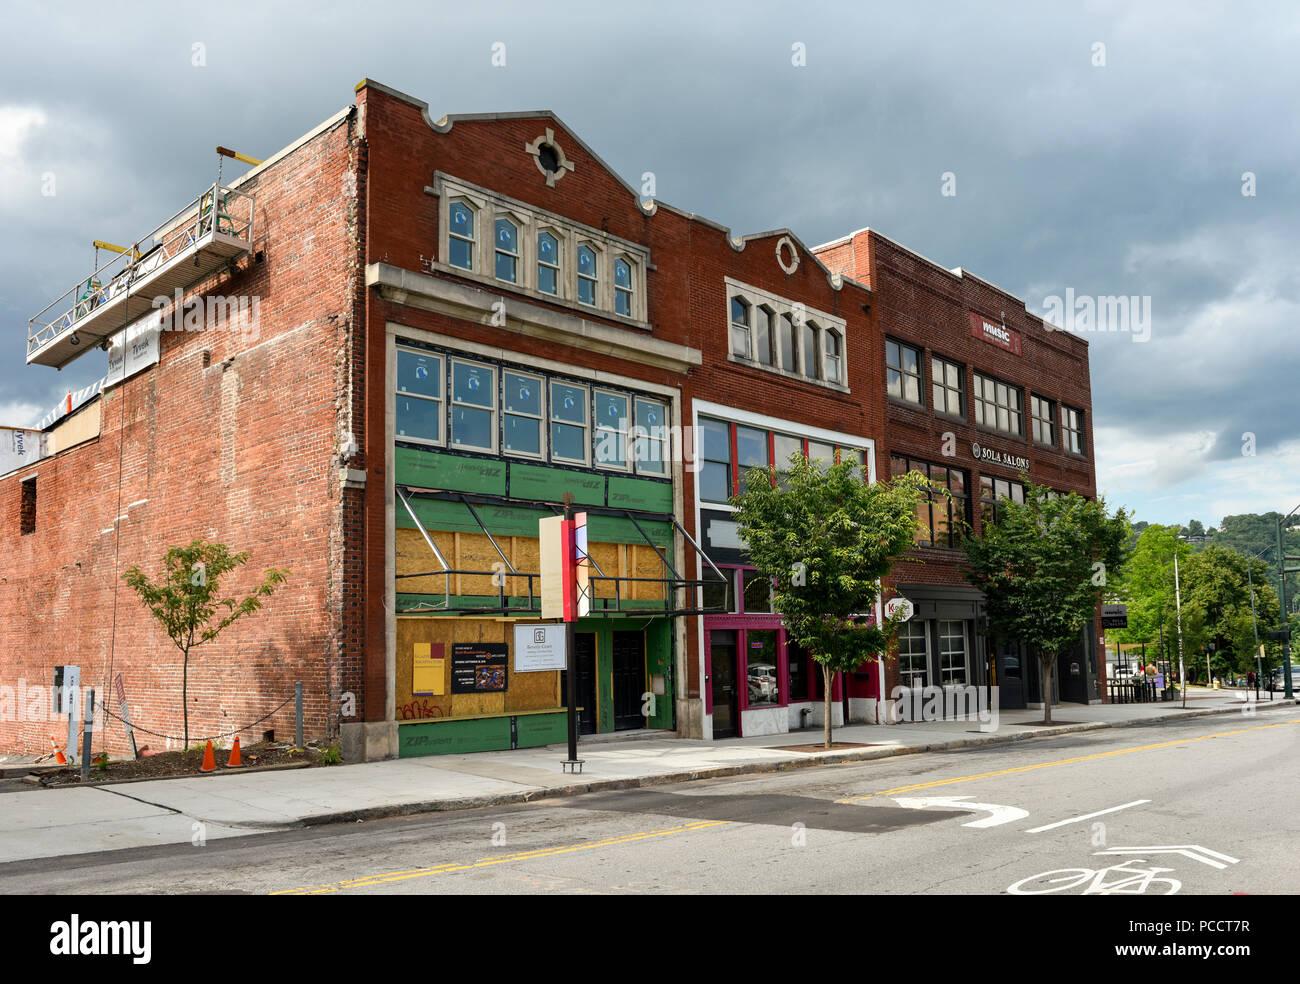 Remodeling old buildings in Asheville, North Carolina, - Stock Image